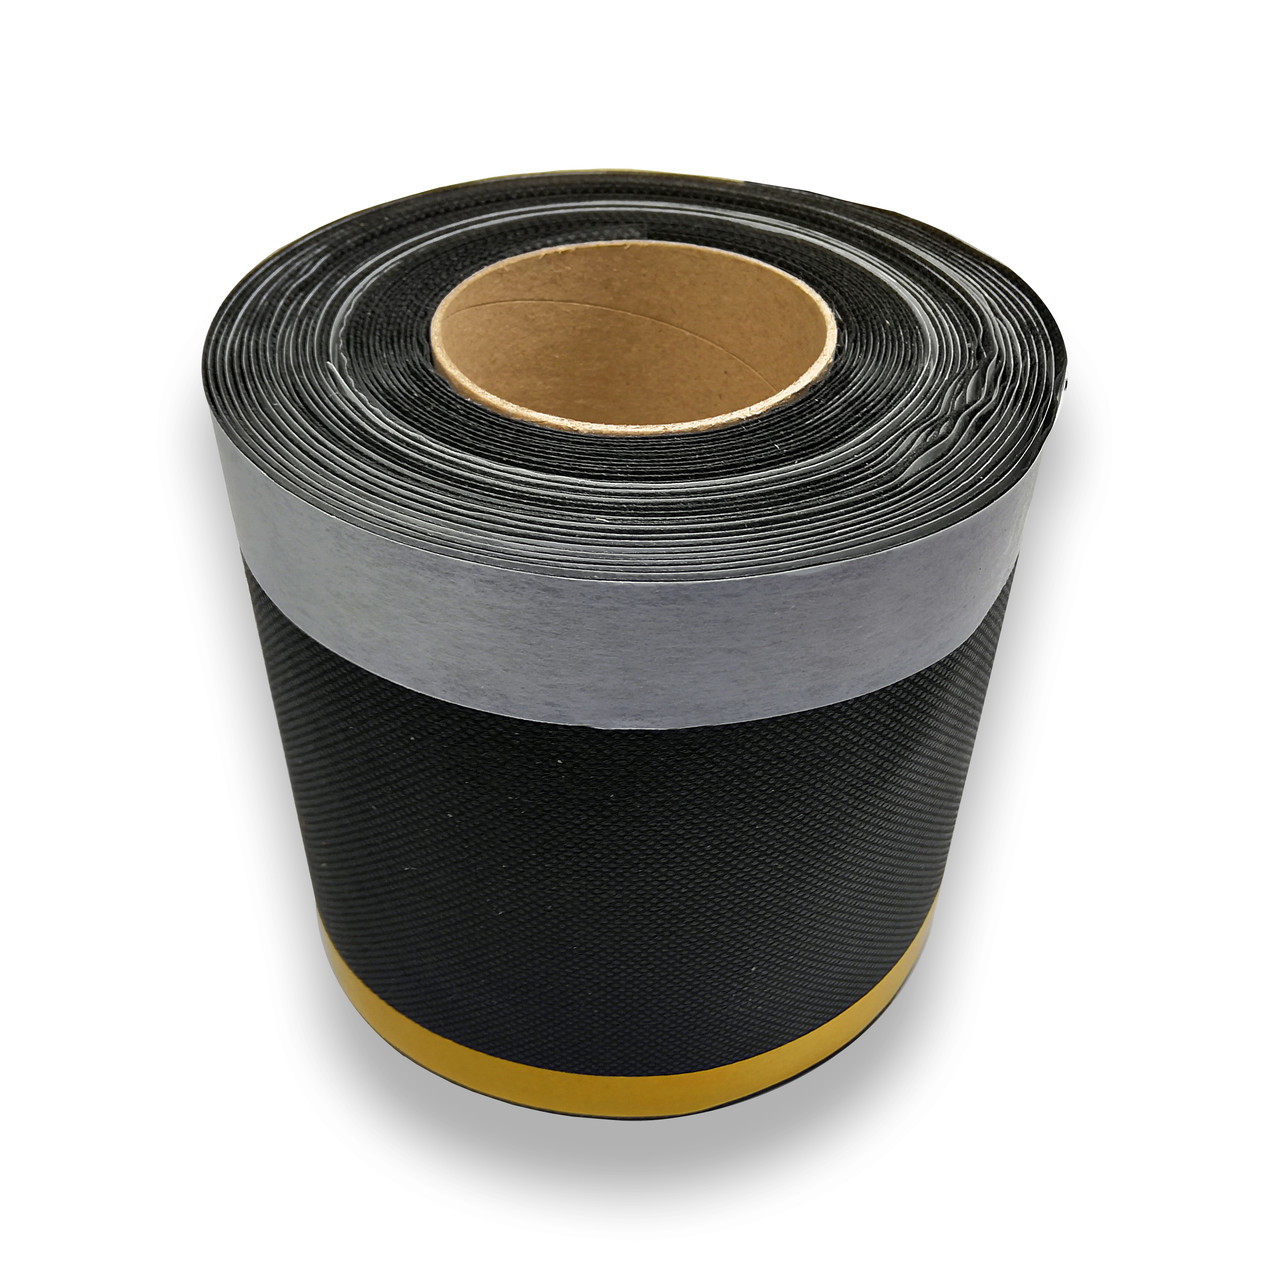 Герметизирующая  лента для монтажа окон наружная 150 мм х 12 м U